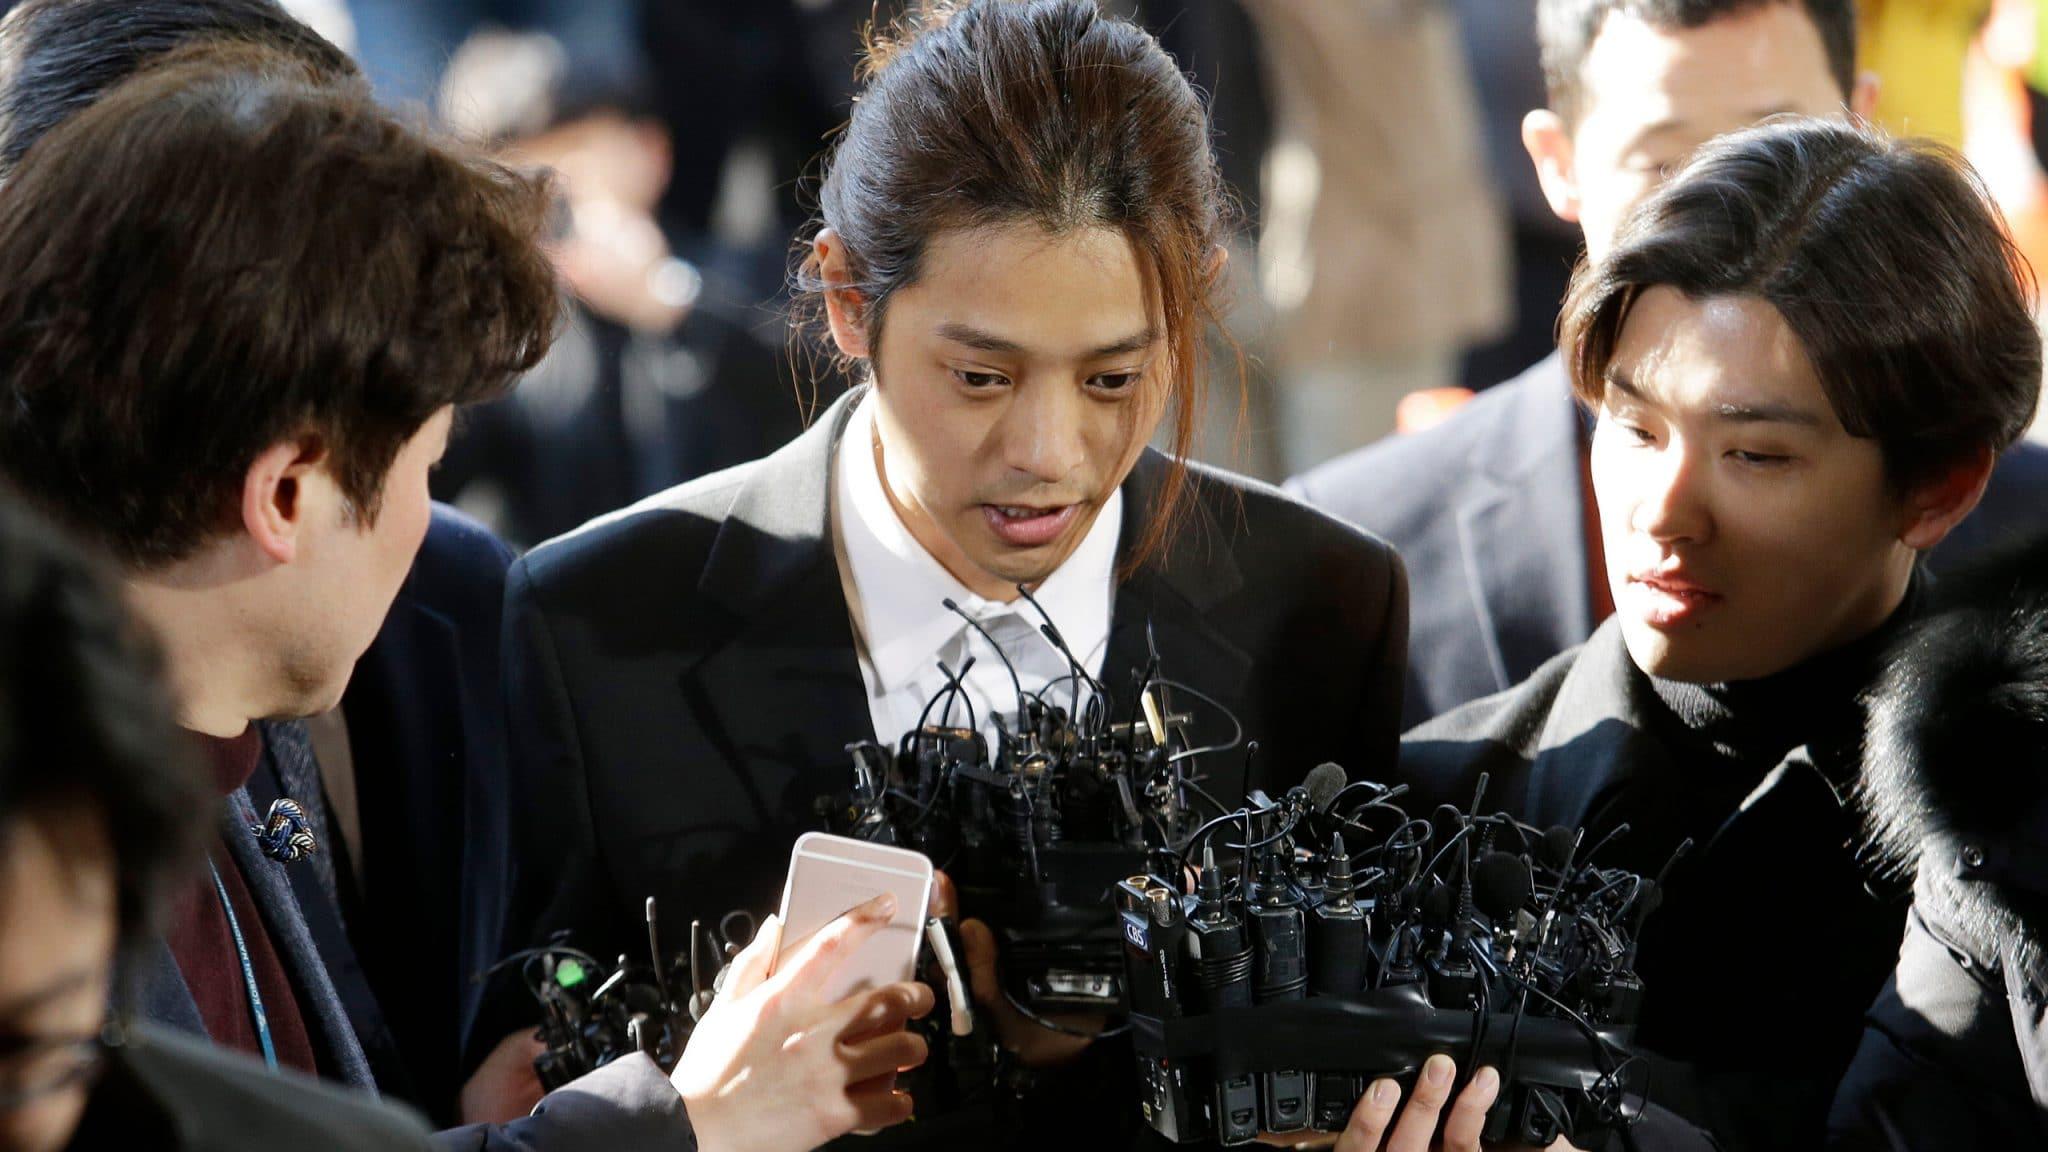 K-pop stars Jung Joon-young and Choi Jong-hoon Guilty for Gang-raping Women serves Imprisonment